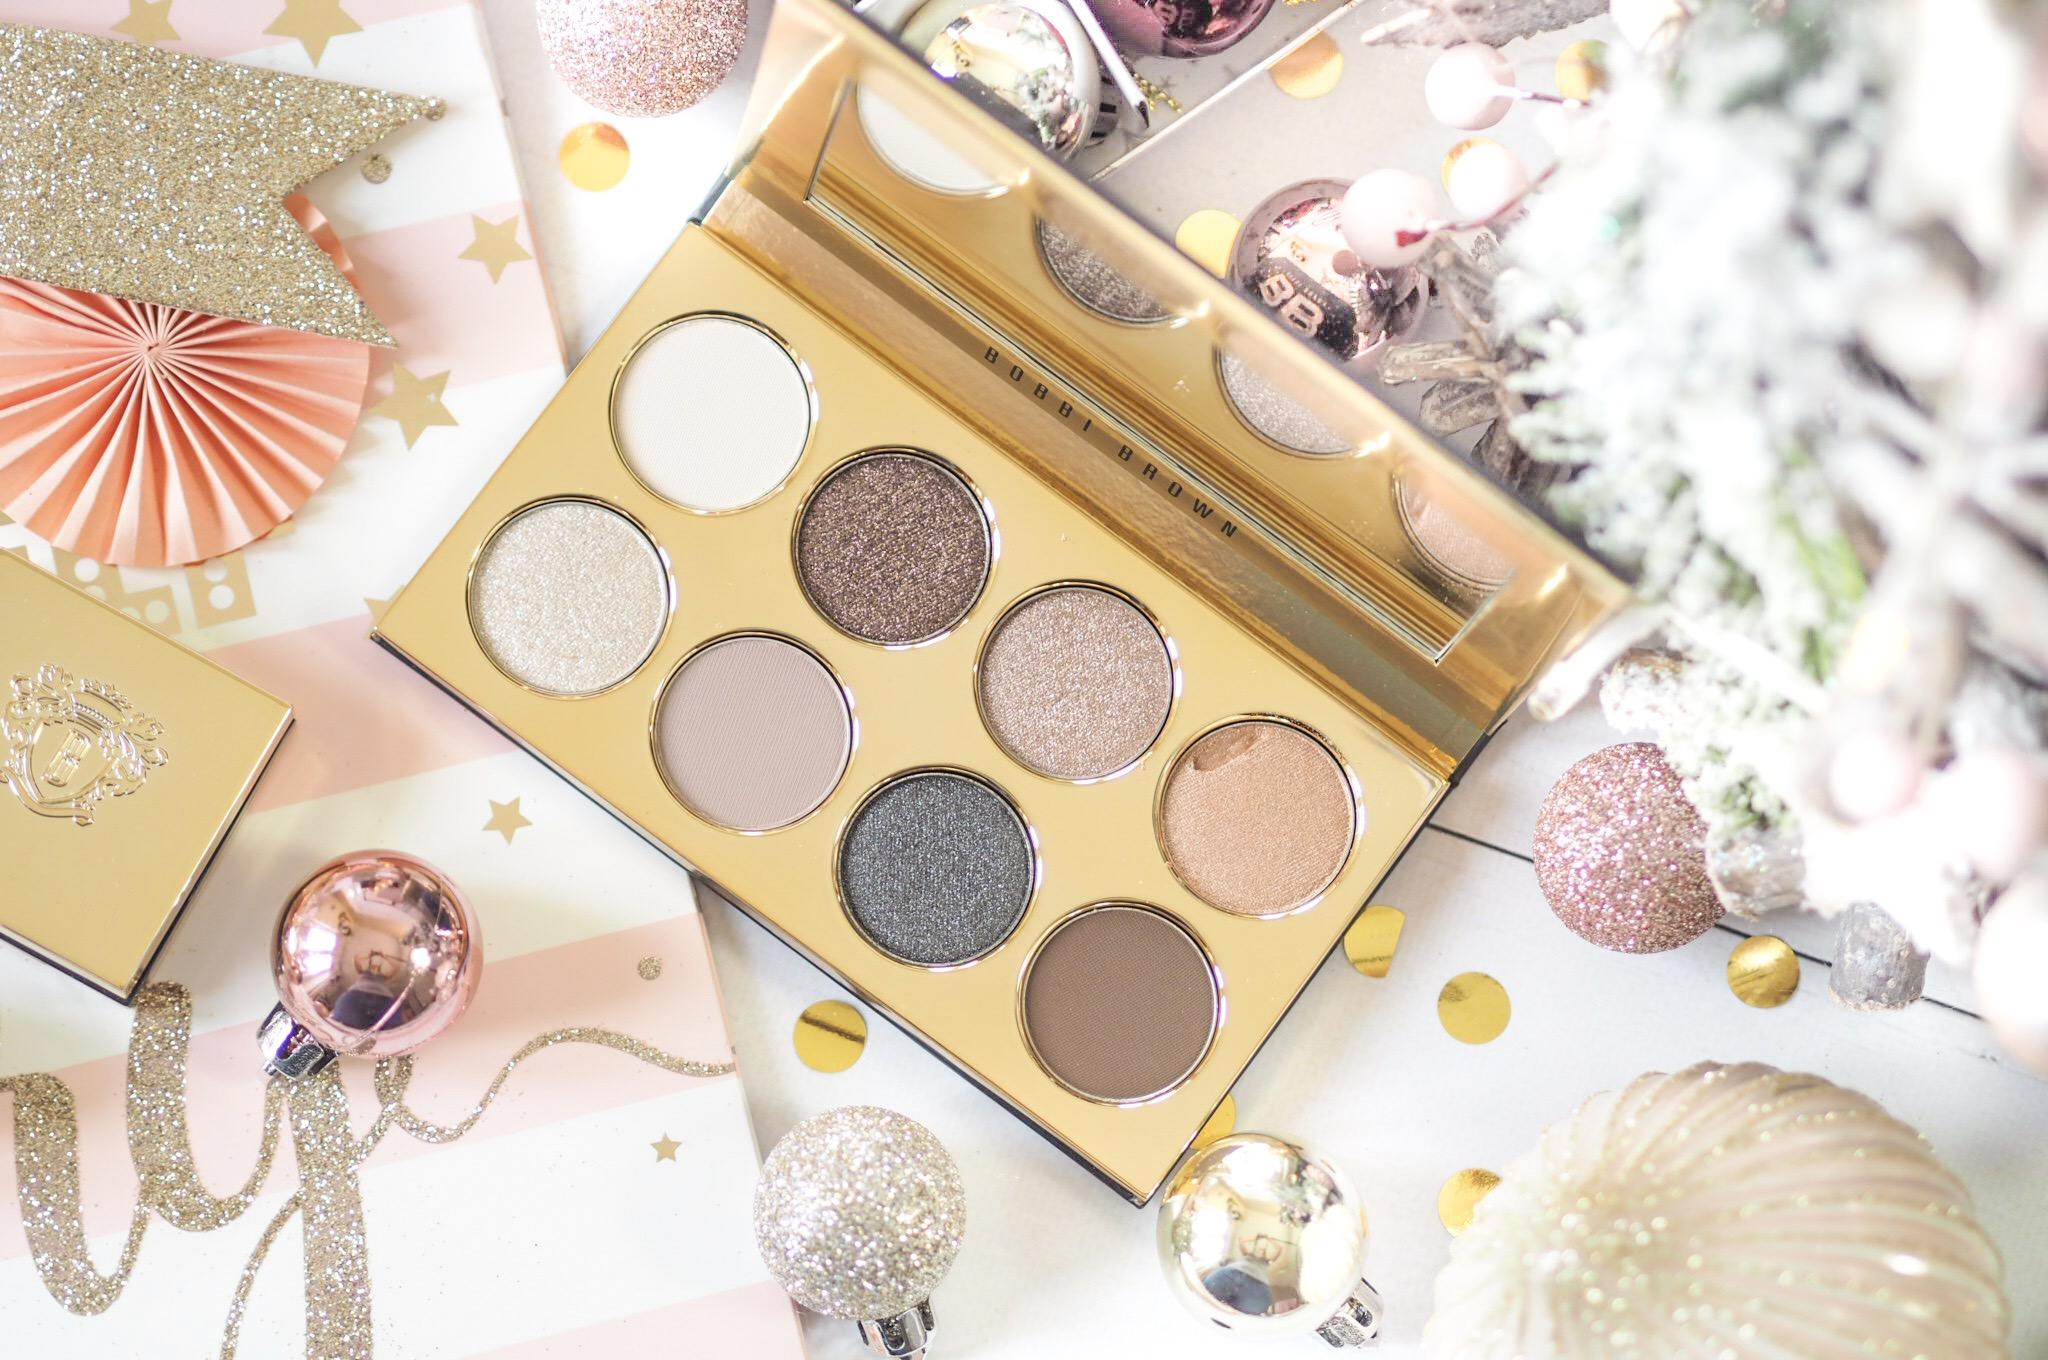 Bobbi Brown Smokey Crystal Eyeshadow Palette Review